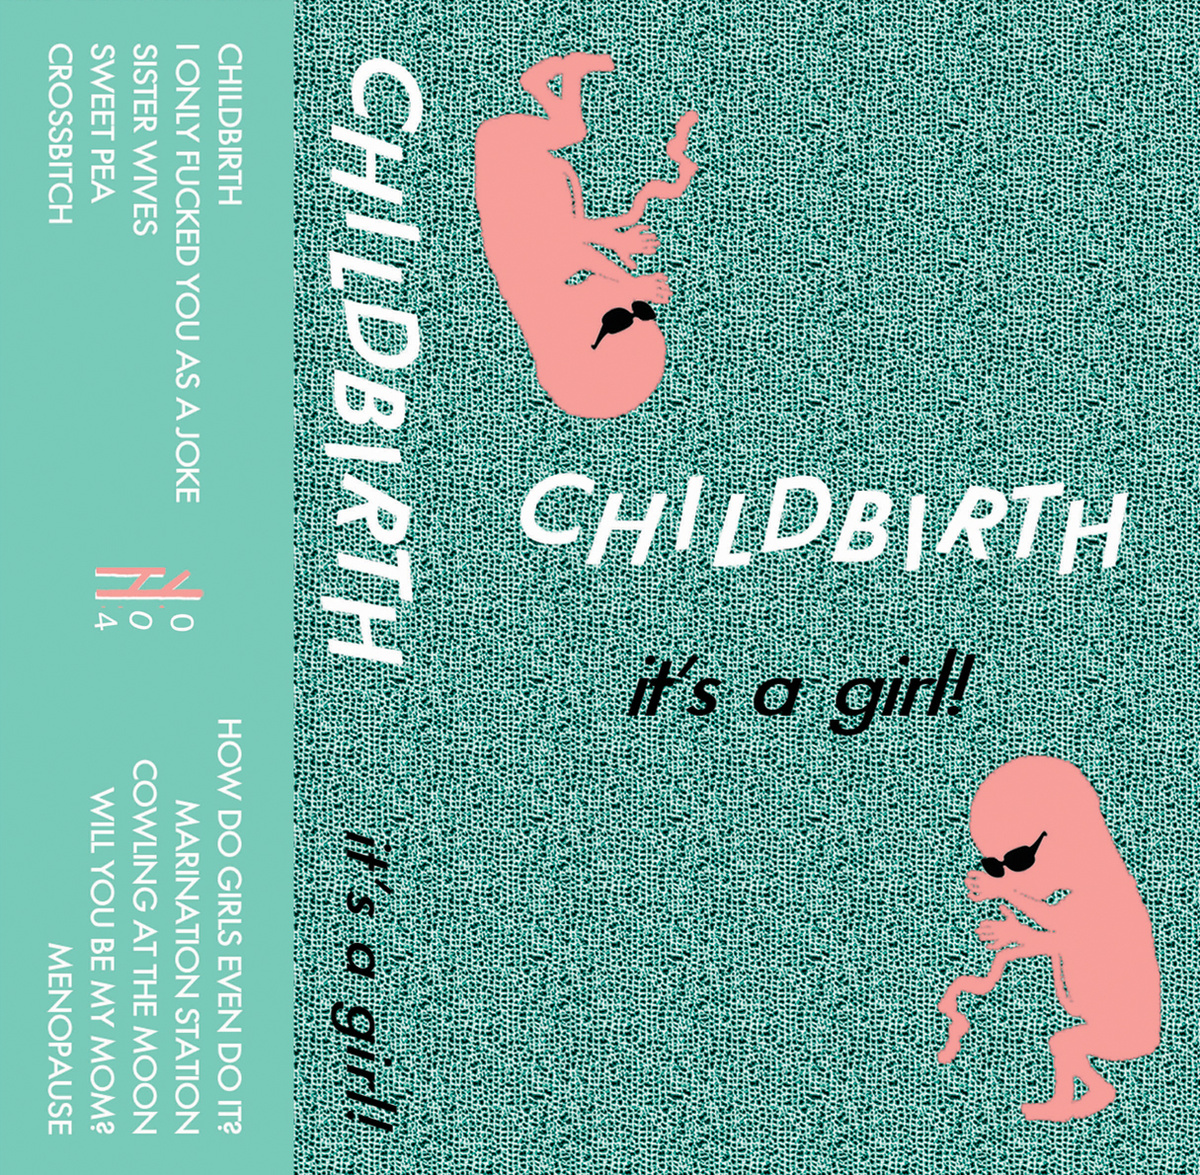 Childbirth - It's a Girl!